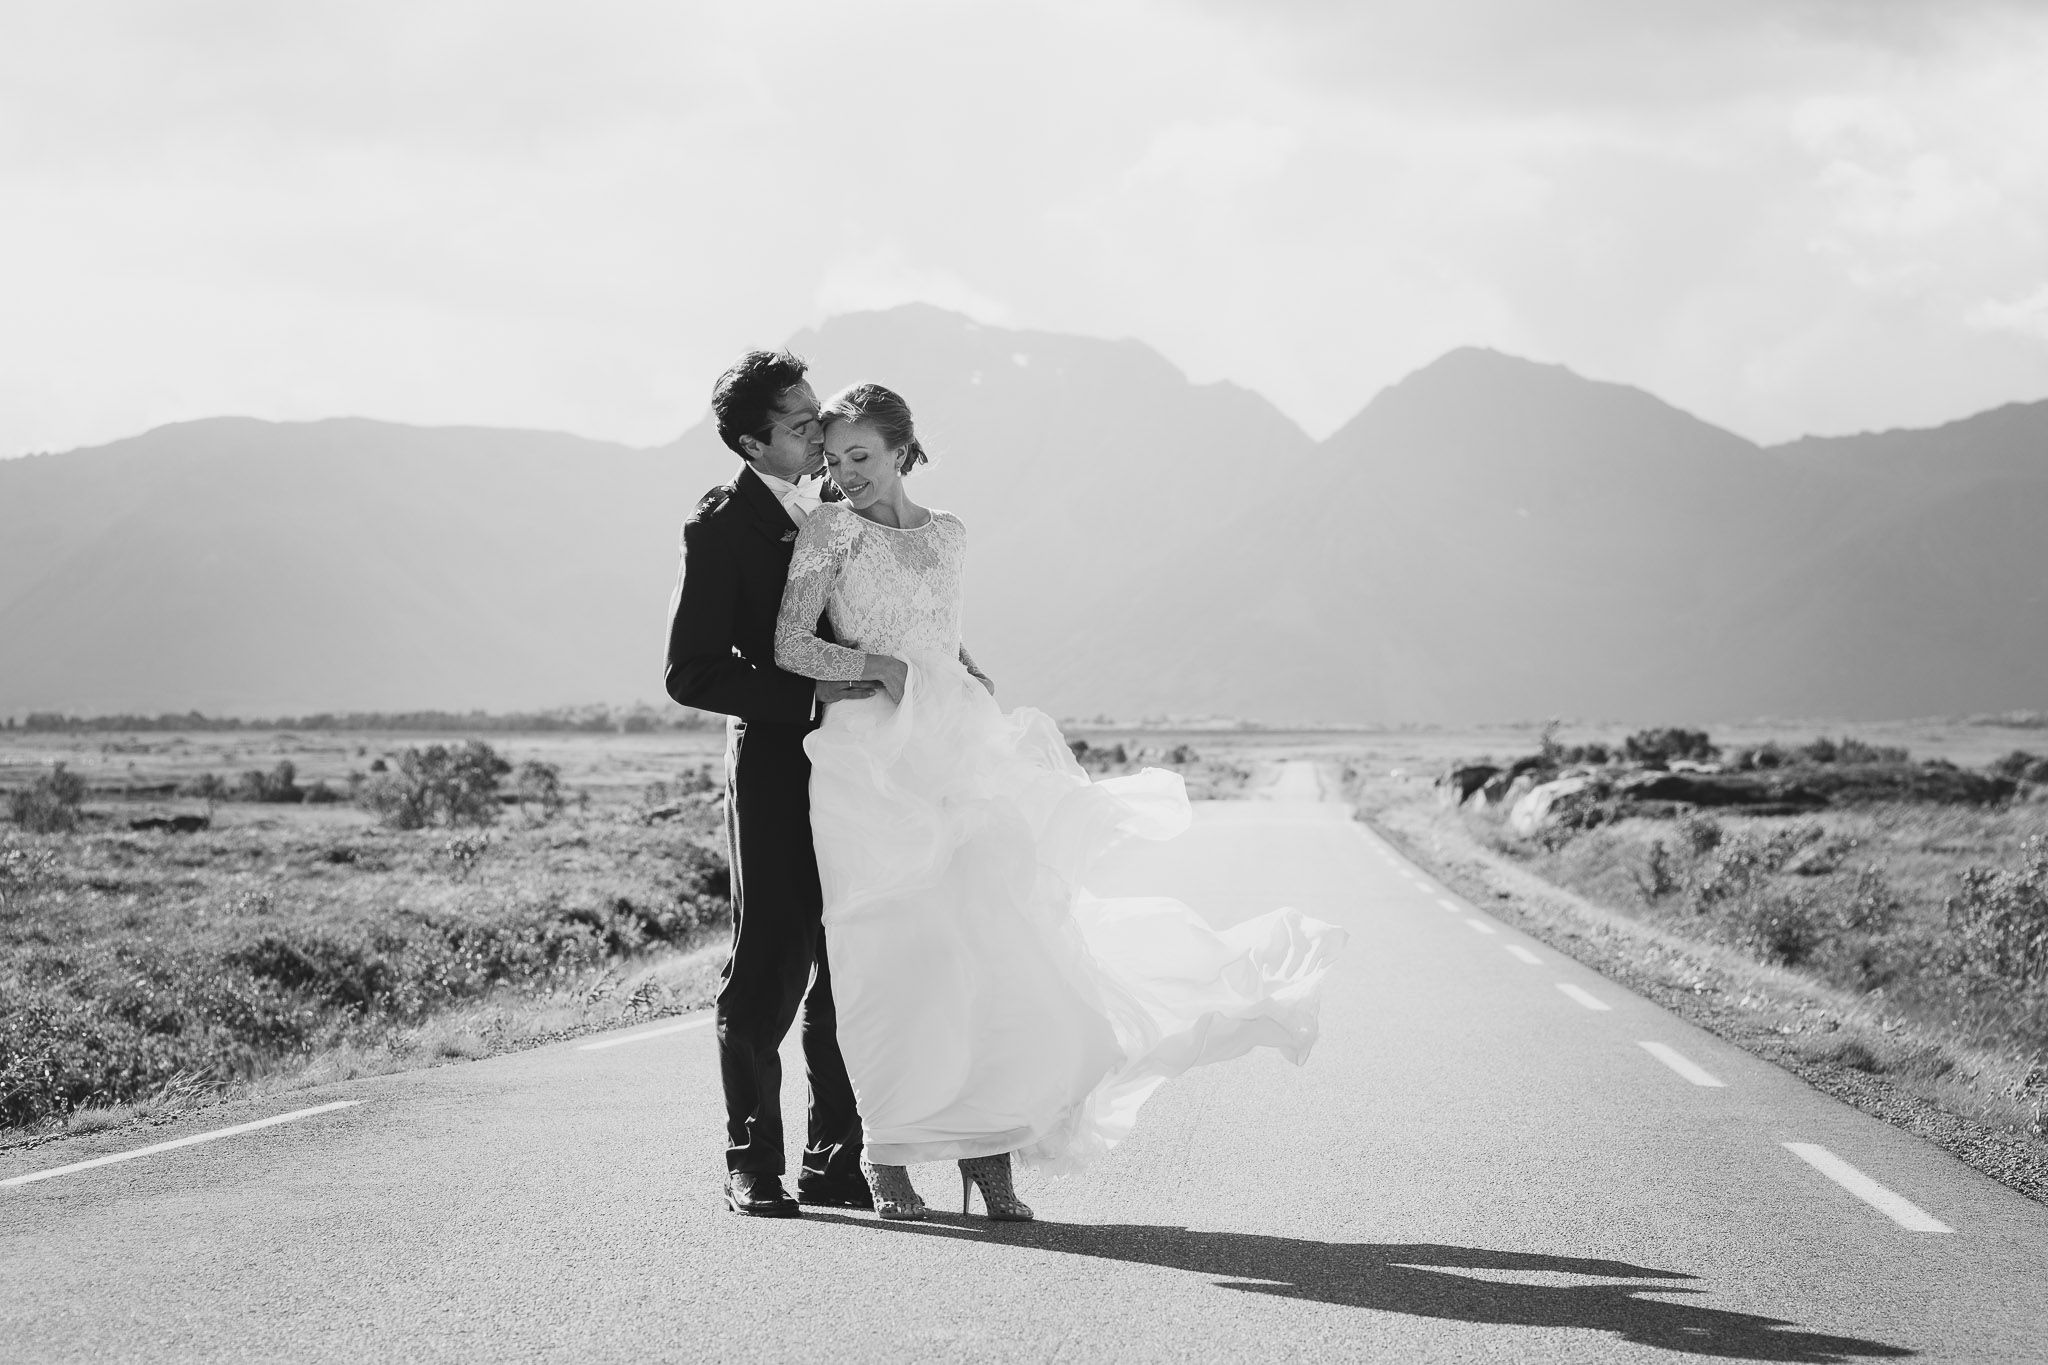 Bryllupsfotografering-lofoten-heldags-fjell-35